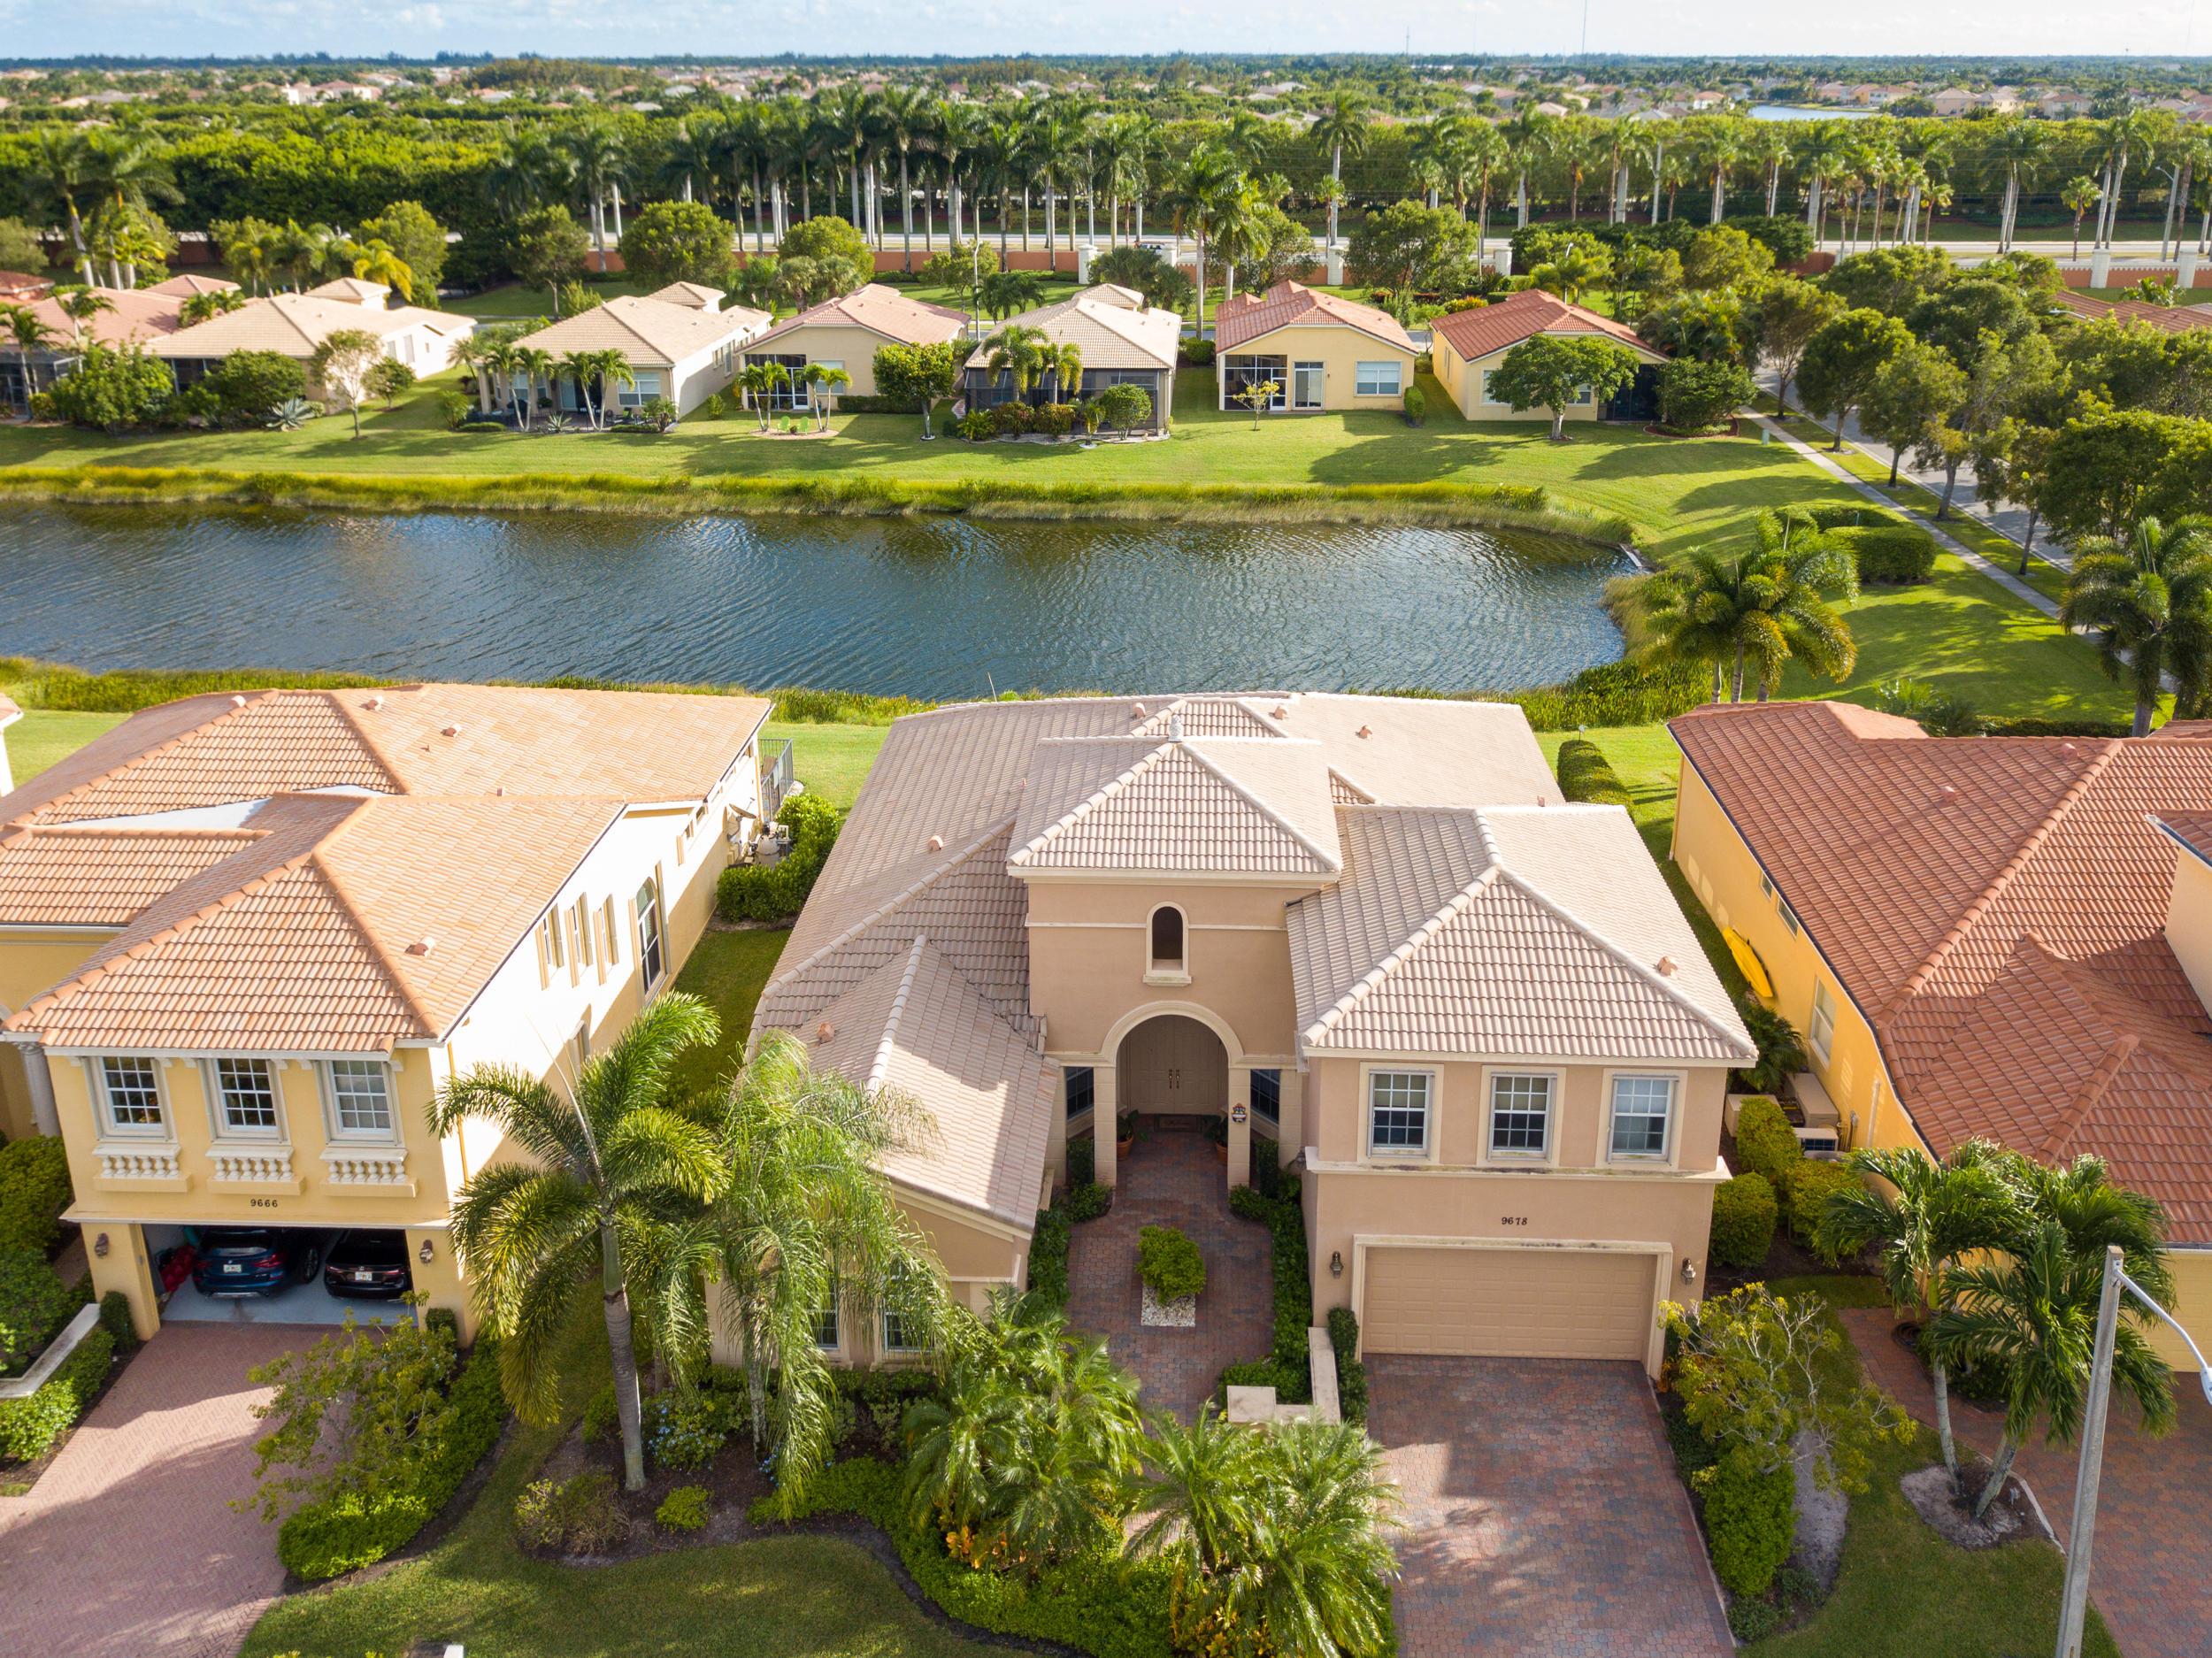 Home for sale in Buena Vida Wellington Florida